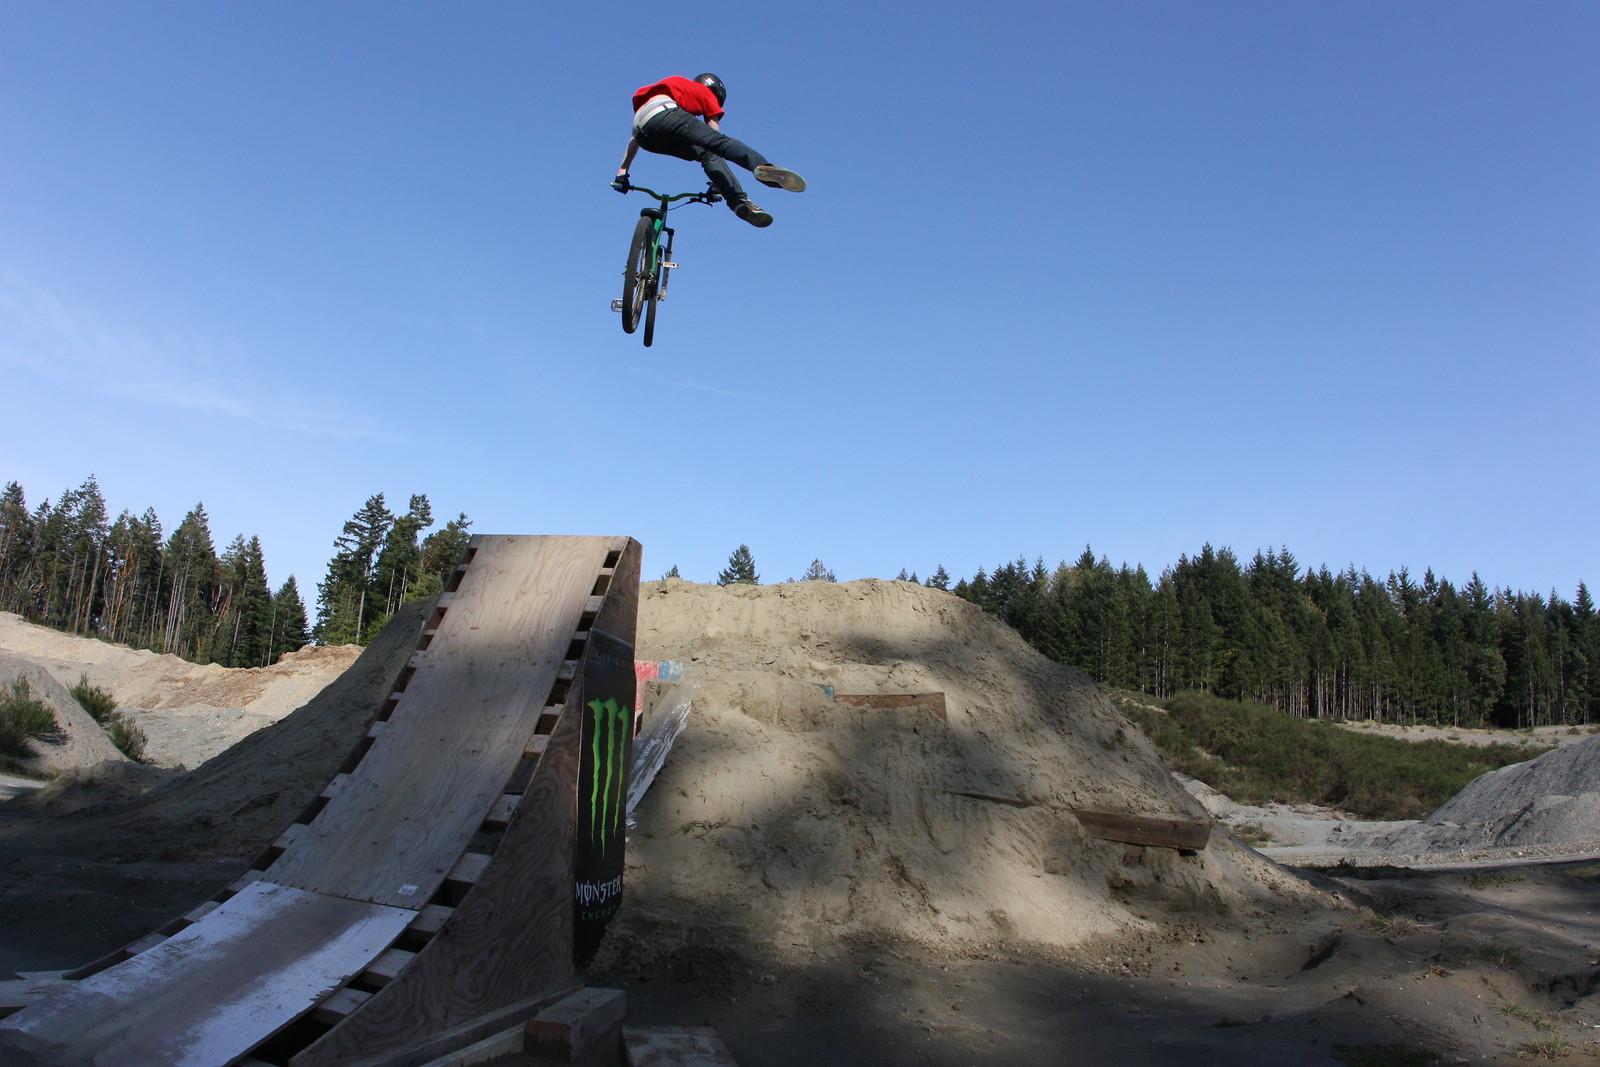 nfc - Super T - Mountain Biking Pictures - Vital MTB